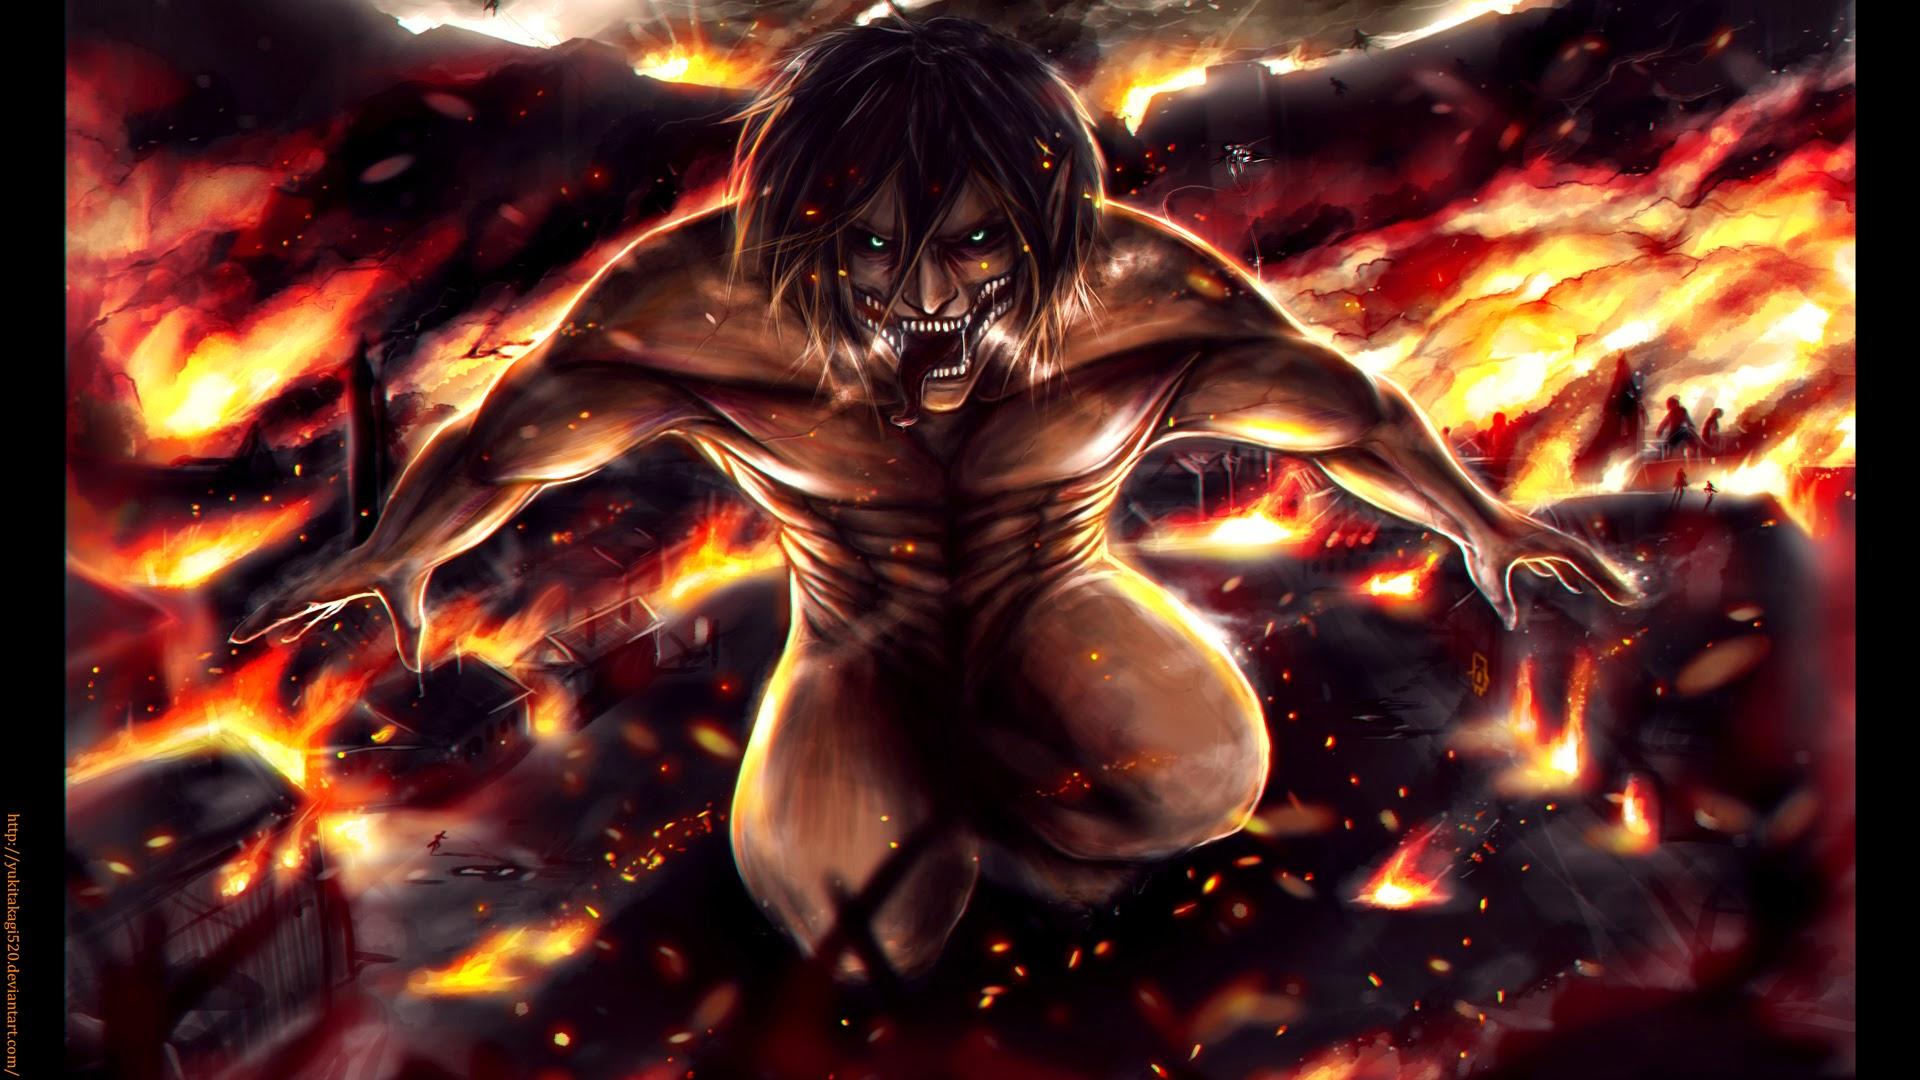 eren yeager jaeger rogue titan attack on titan shingeki no kyojin 1920x1080